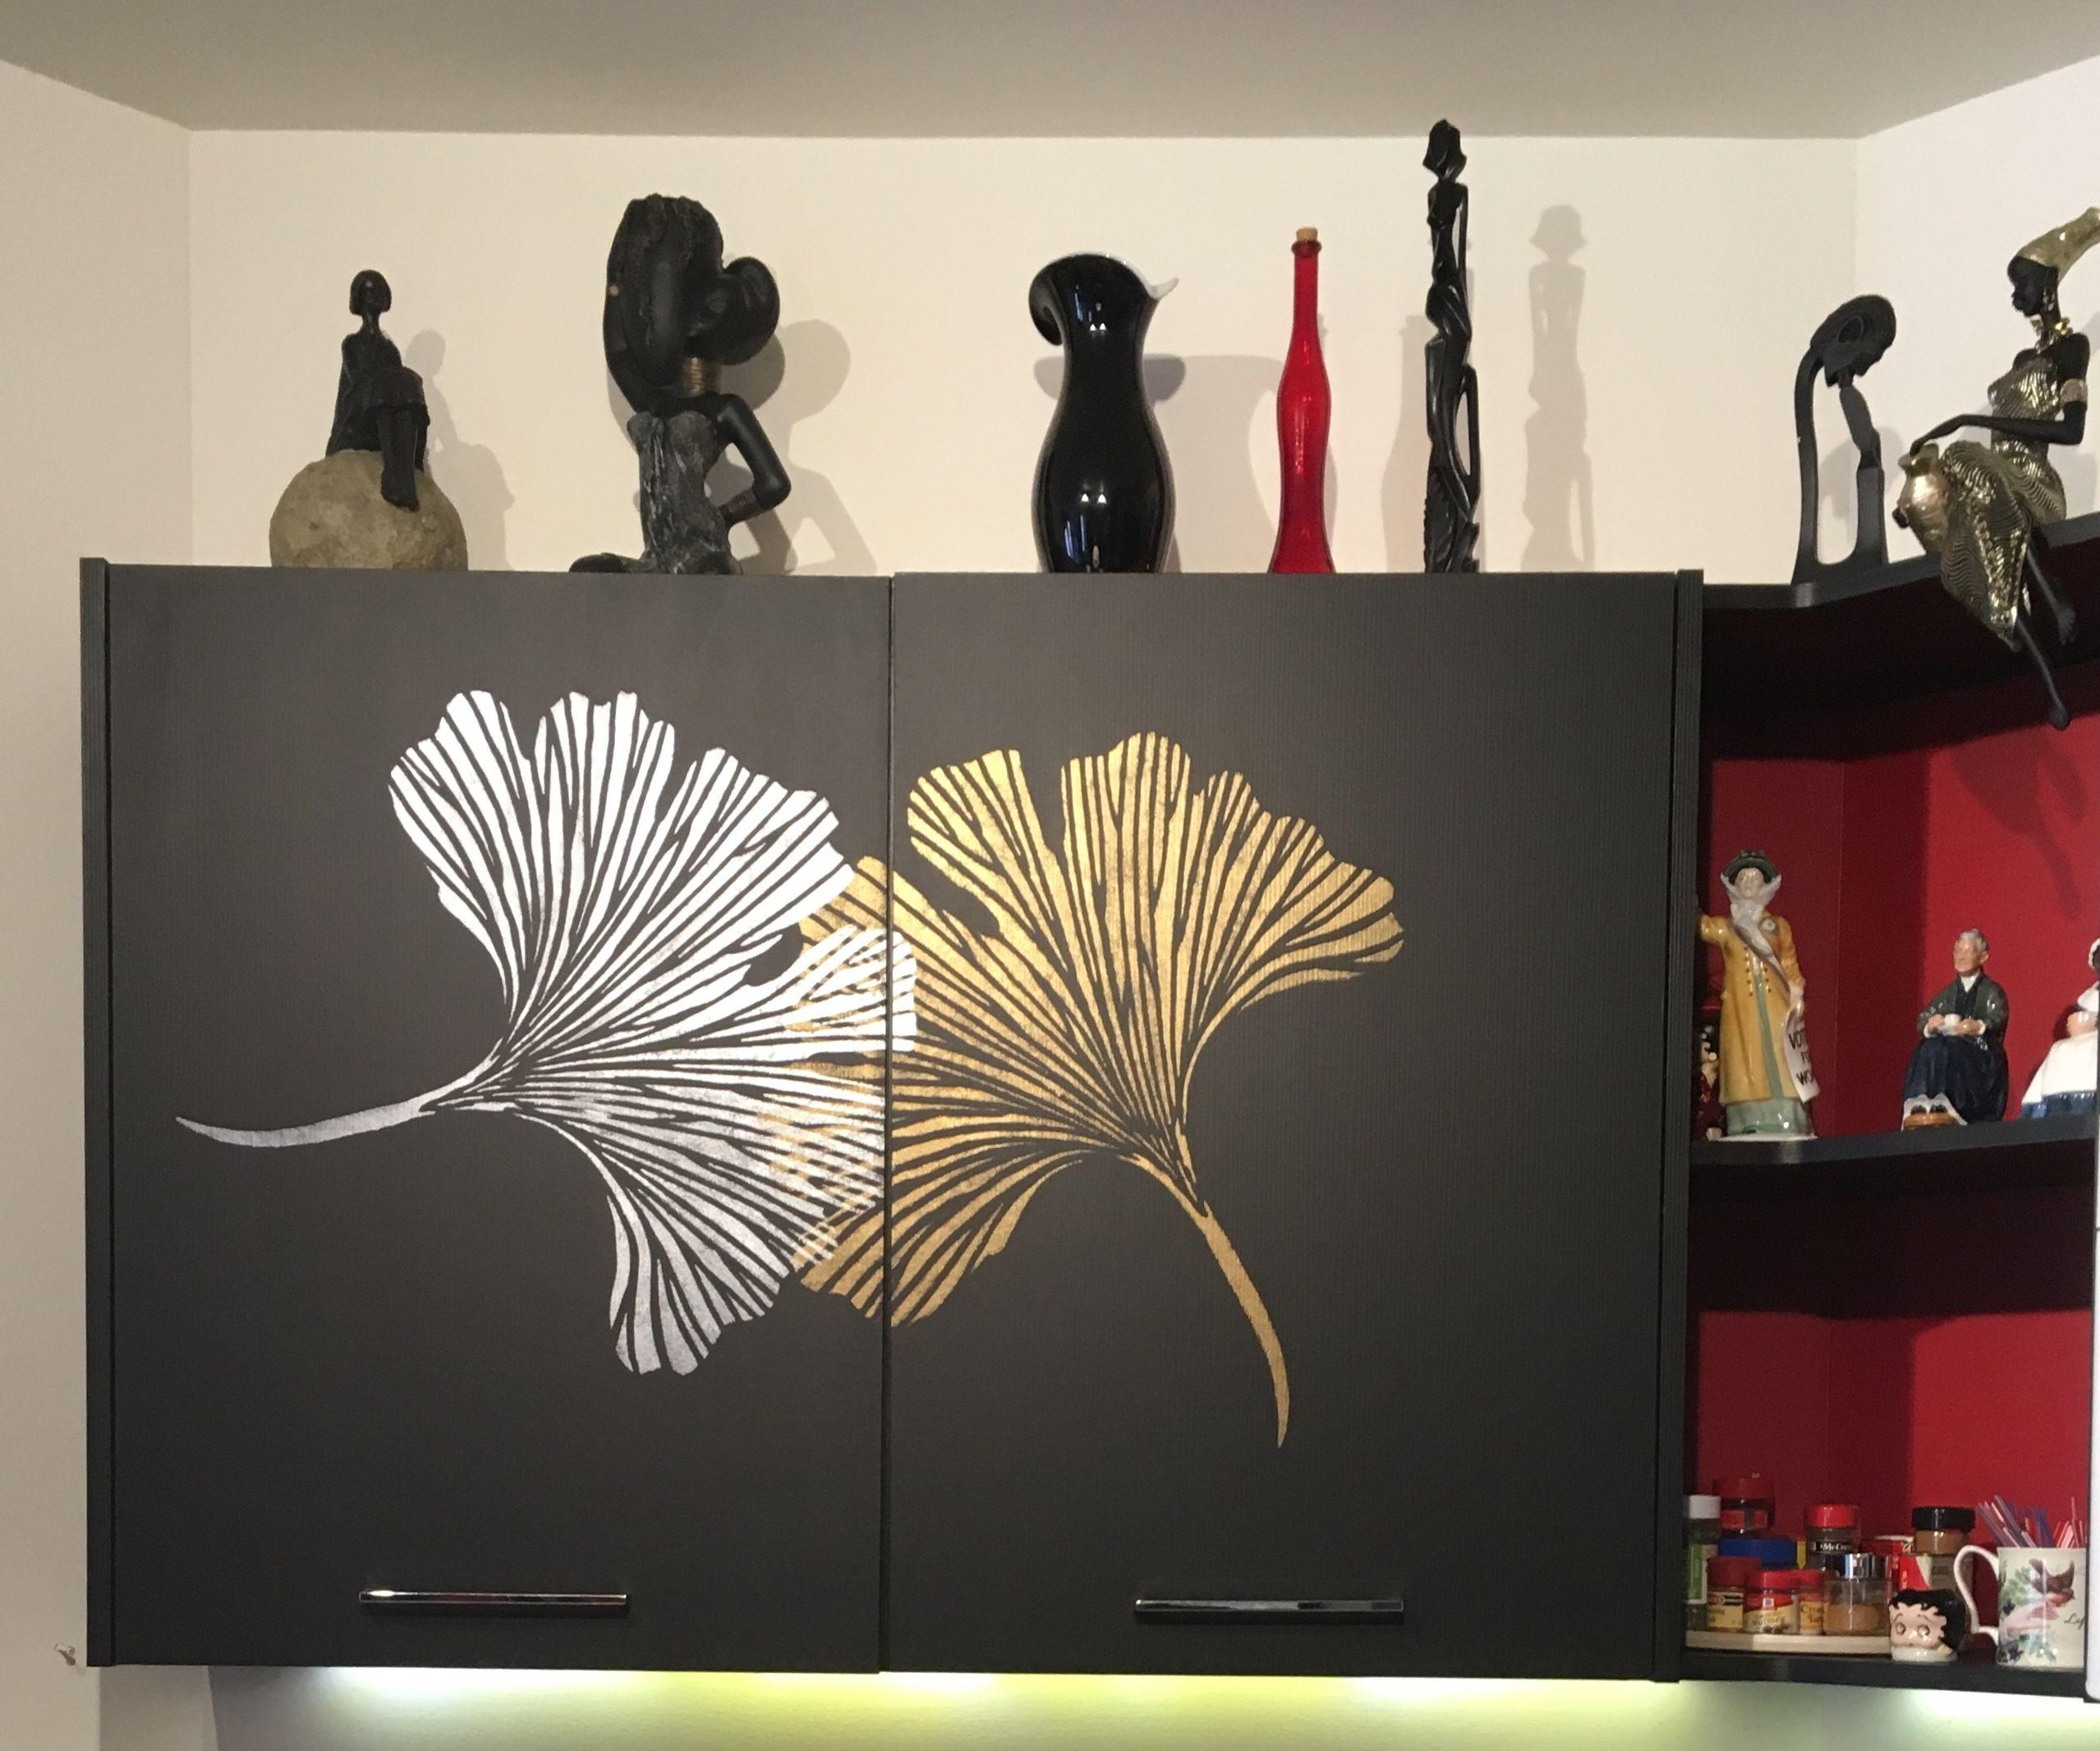 Pin On Diy Decorating Ideas Using Stencils